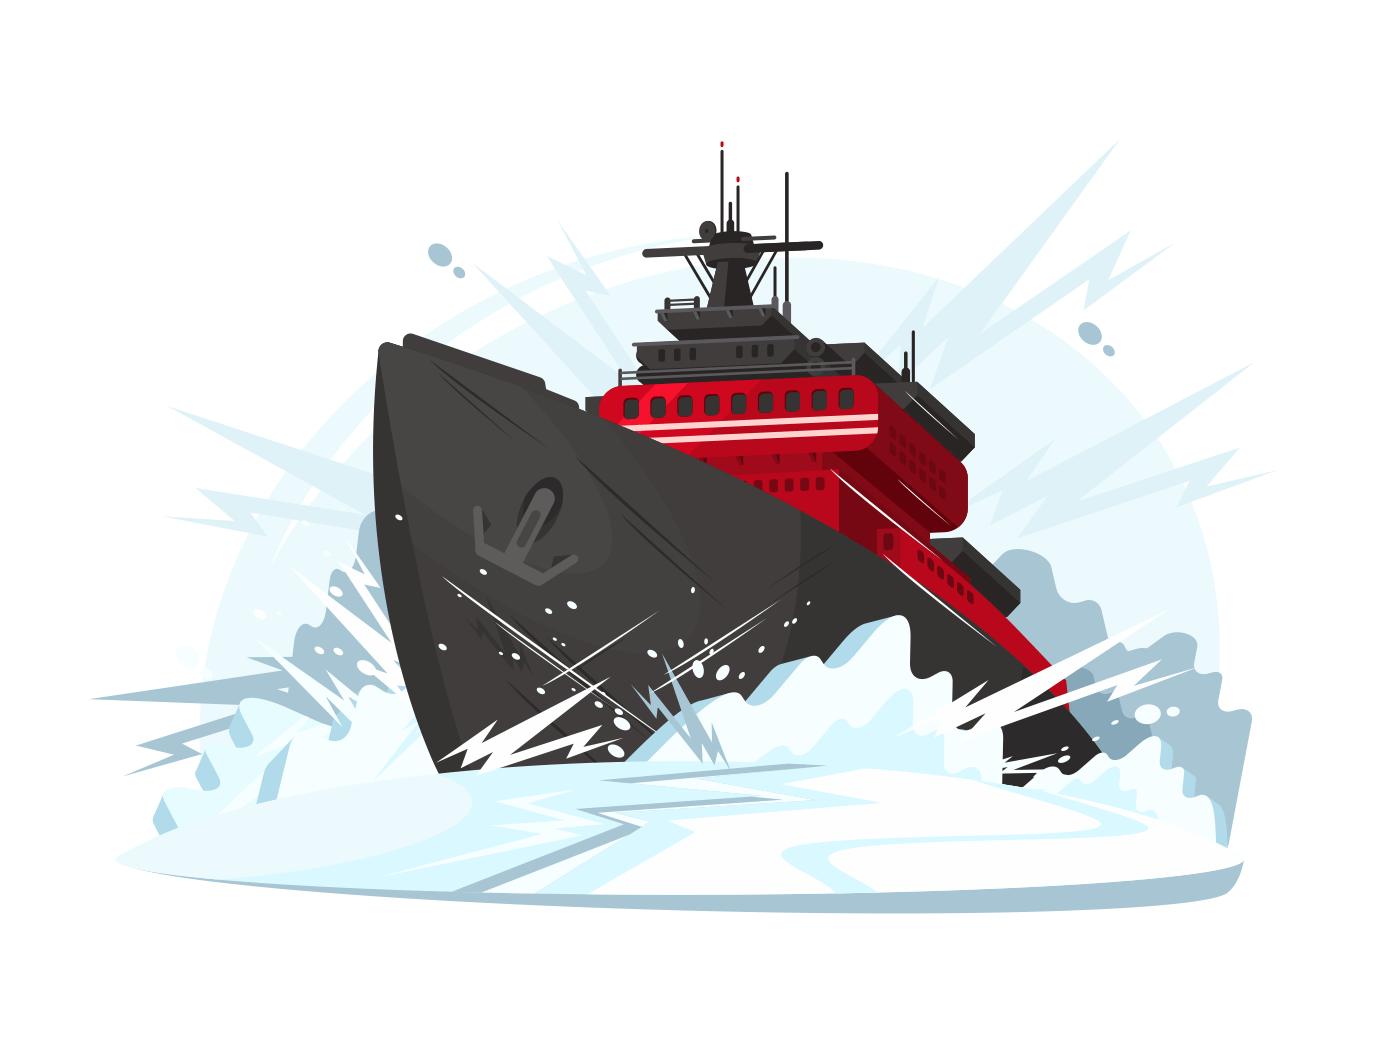 Icebreaker breaks ice illustration